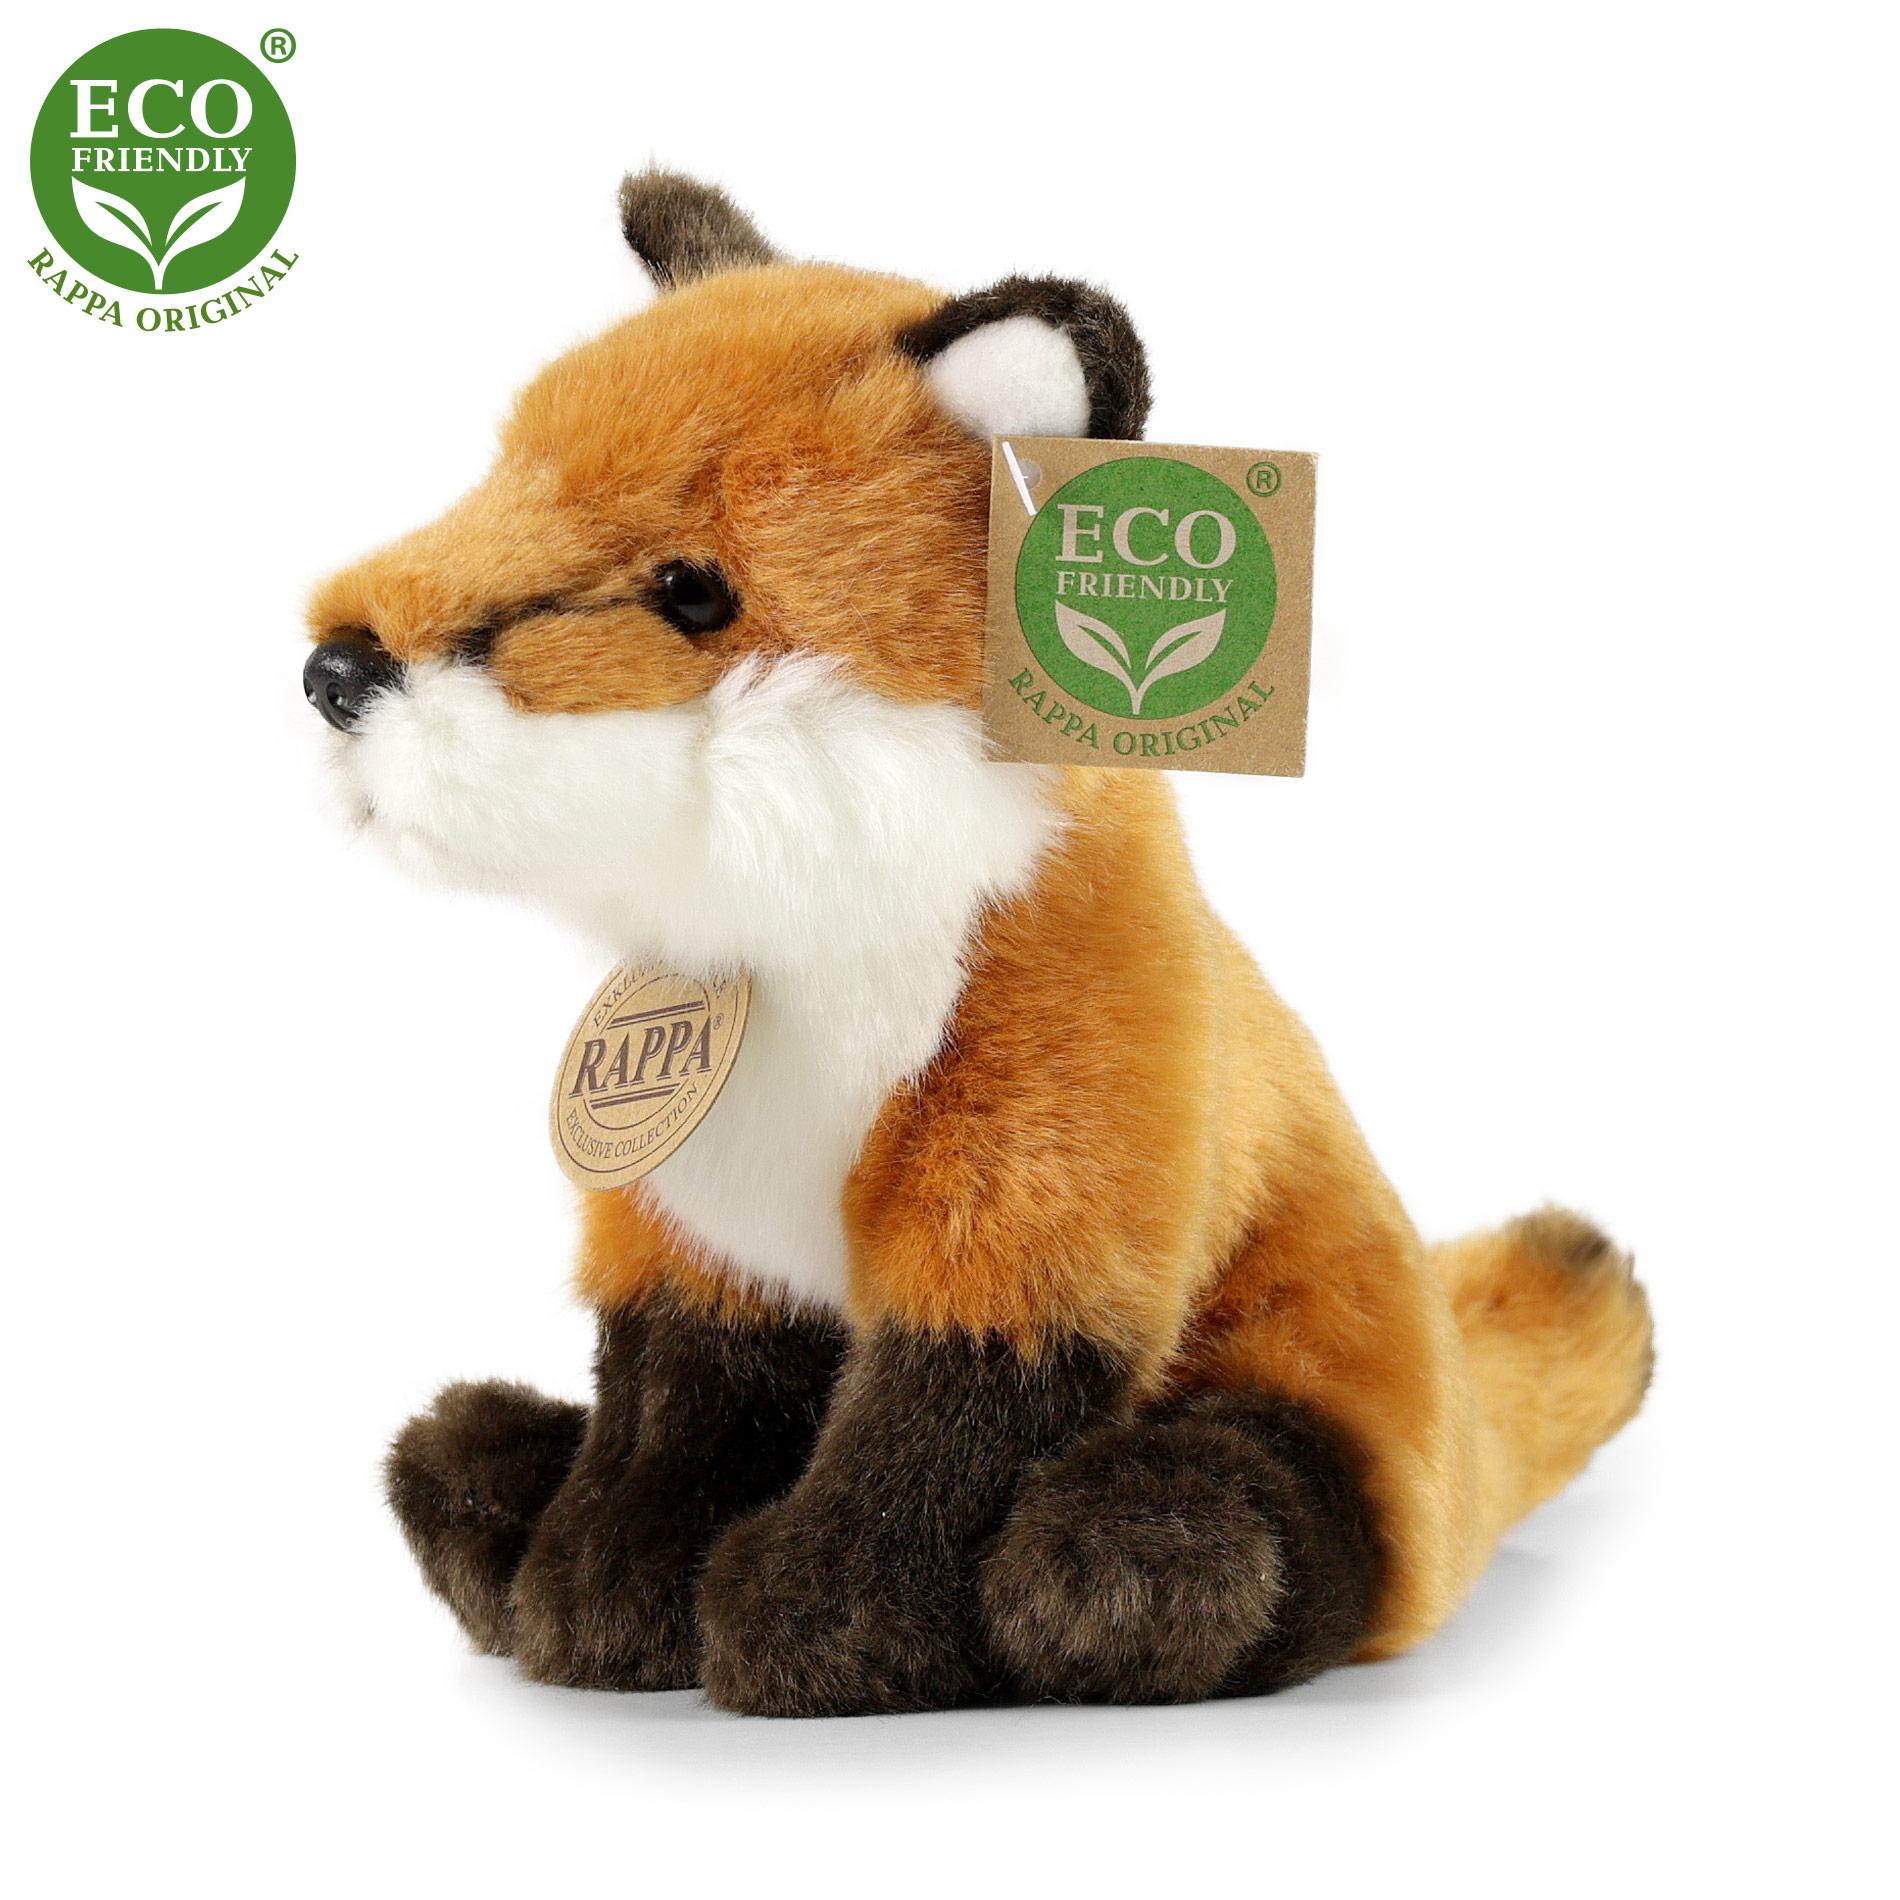 Plyšová liška sedící 18 cm ECO-FRIENDLY